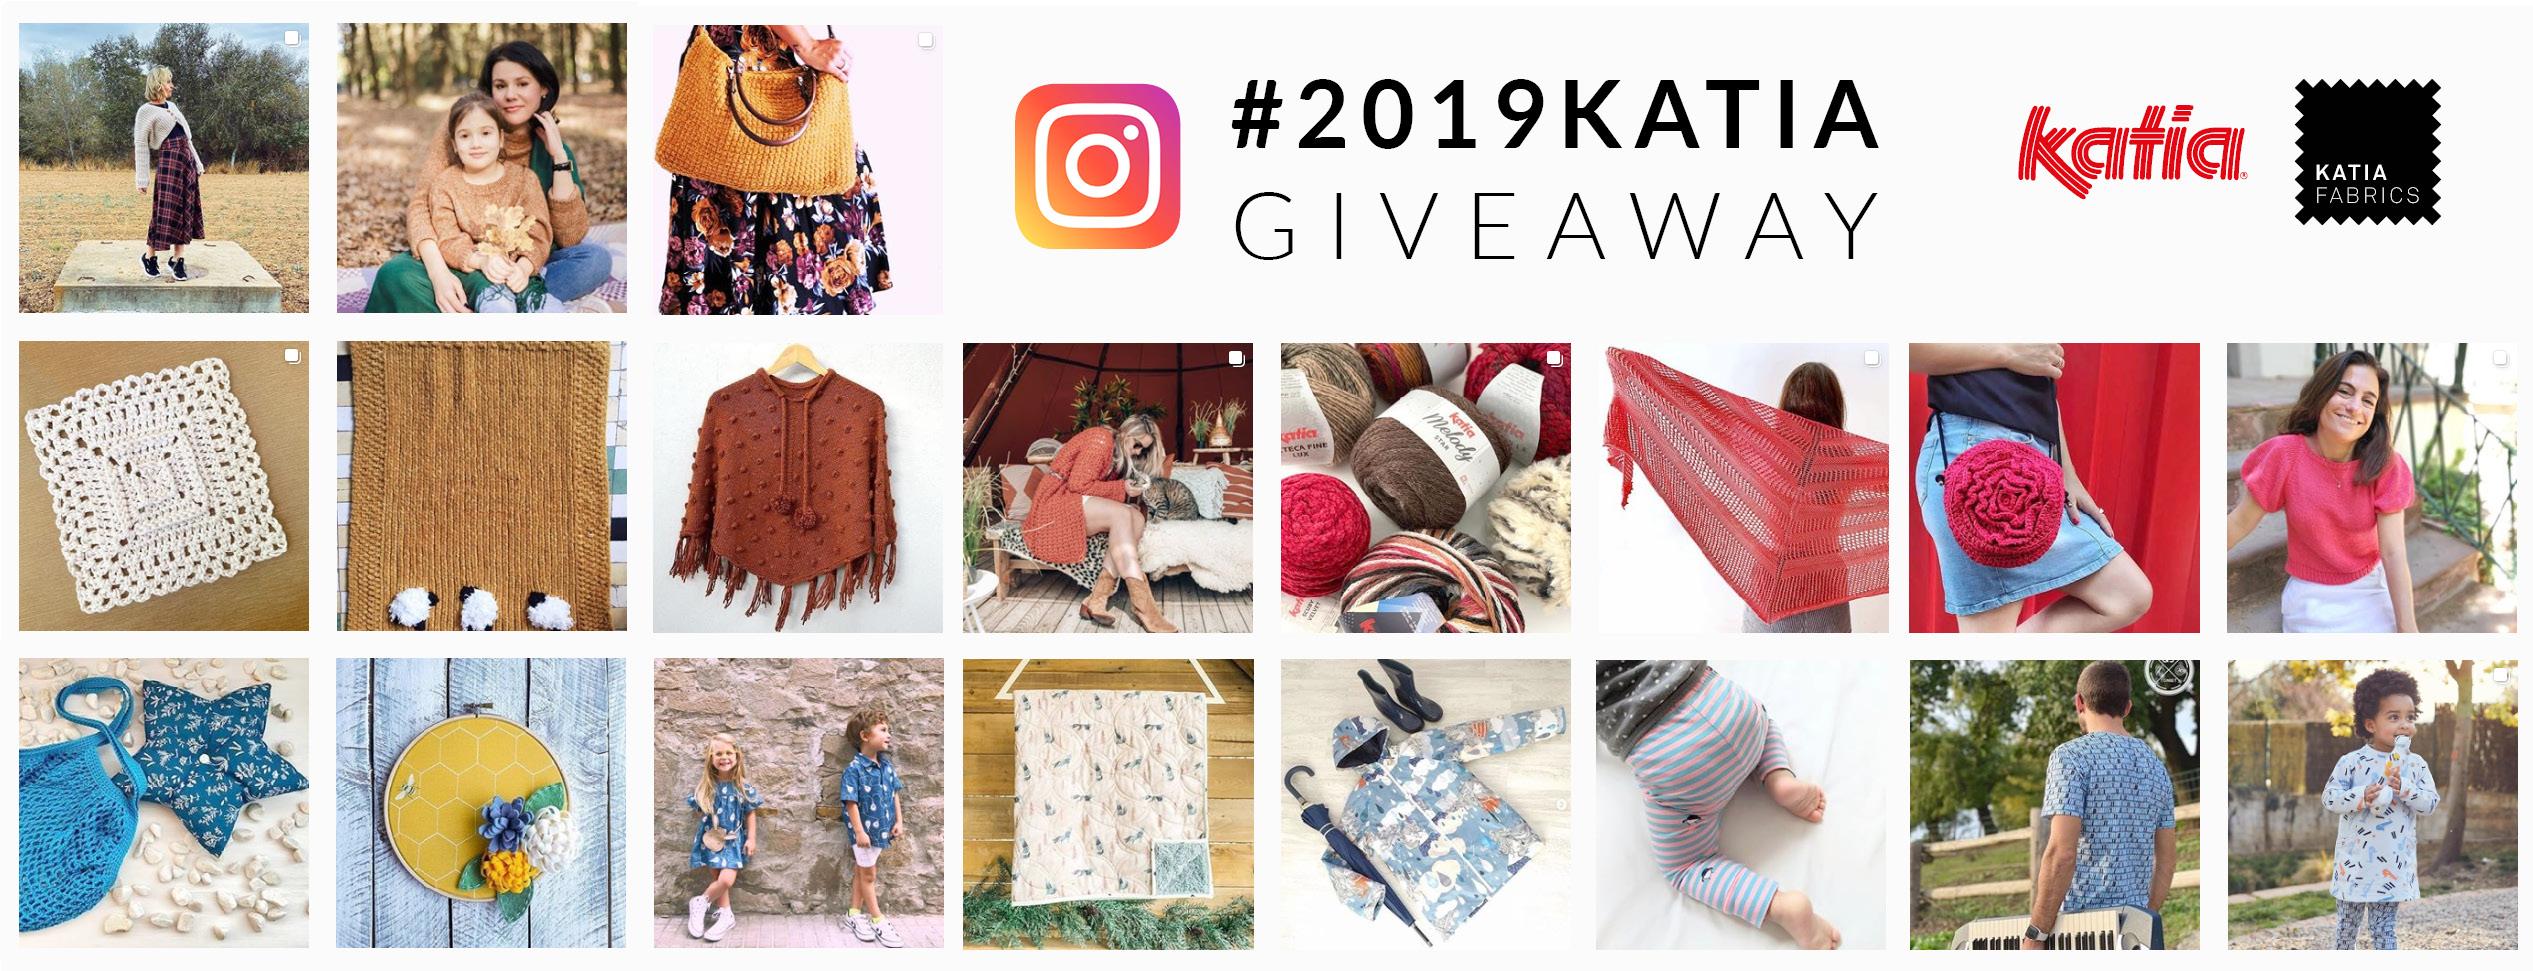 Made with Katia giveaway 2019